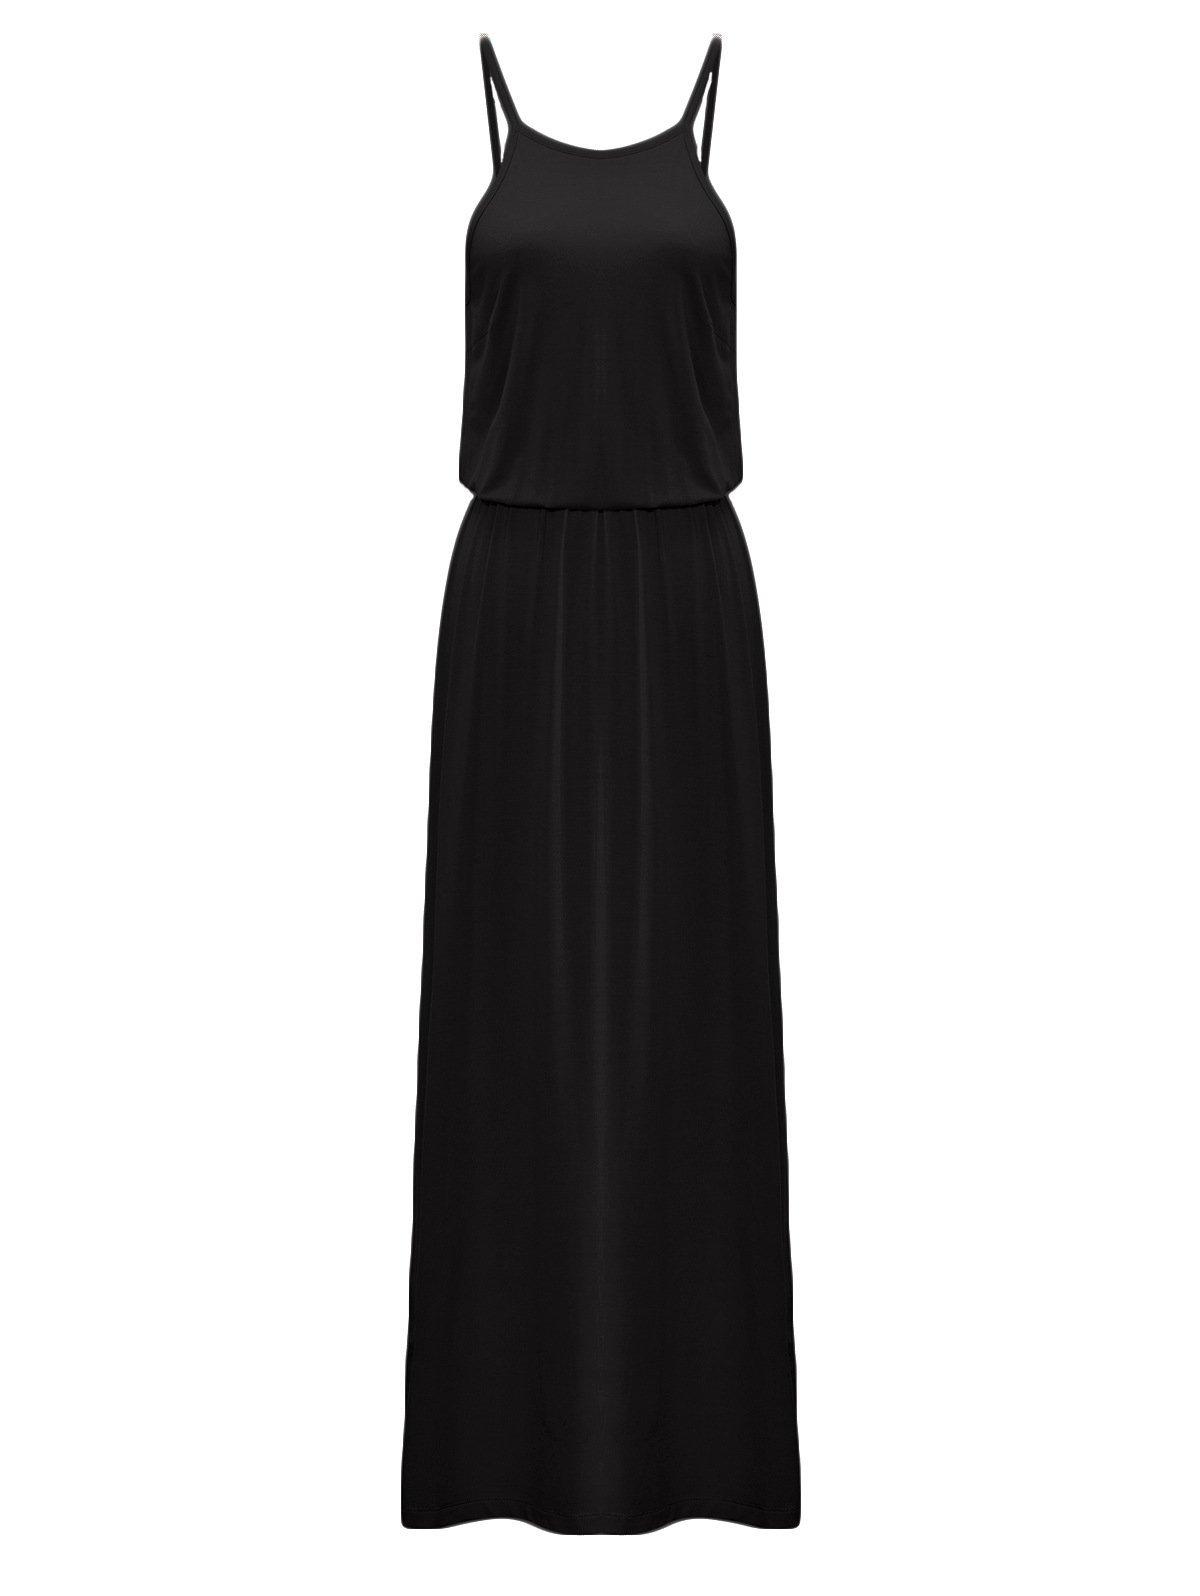 ZURIFFE Women's Summer Knitted Sleeveless Halter Maxi Dress Black M